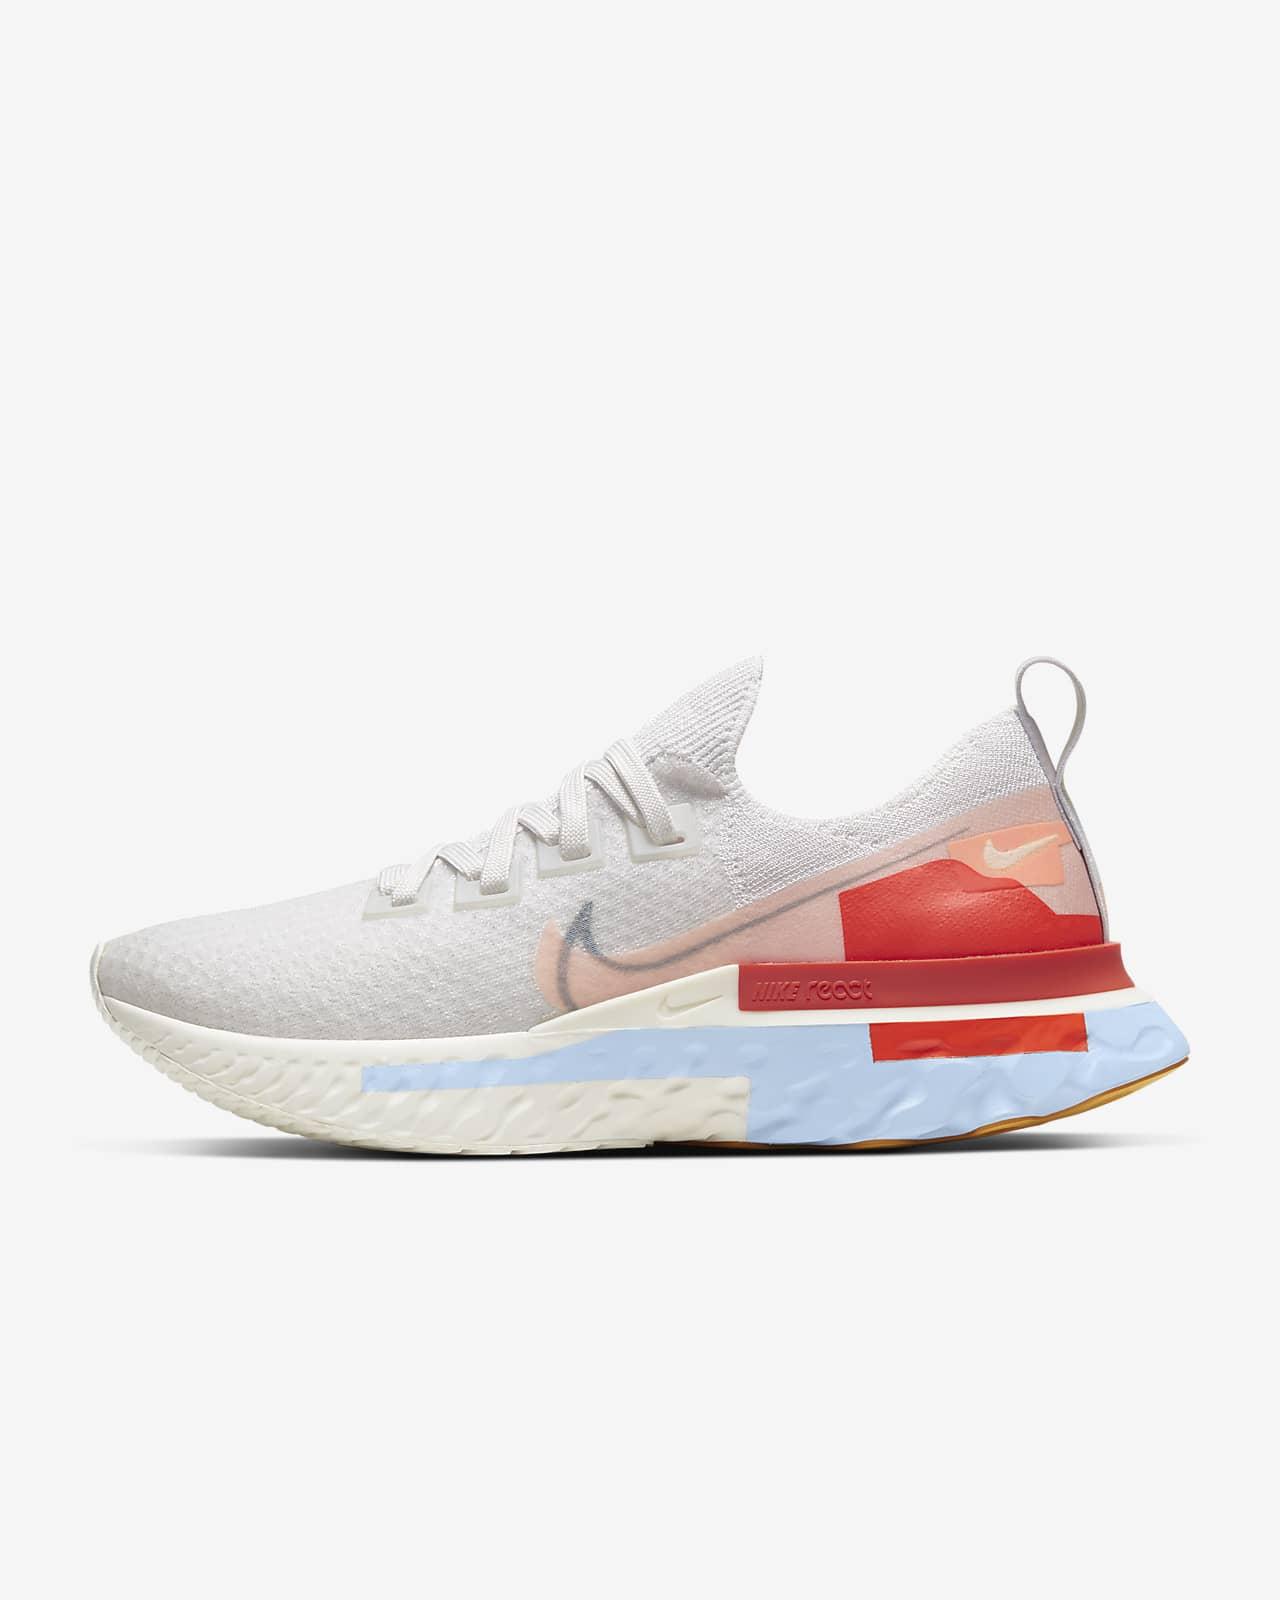 Nike React Infinity Run Flyknit Premium